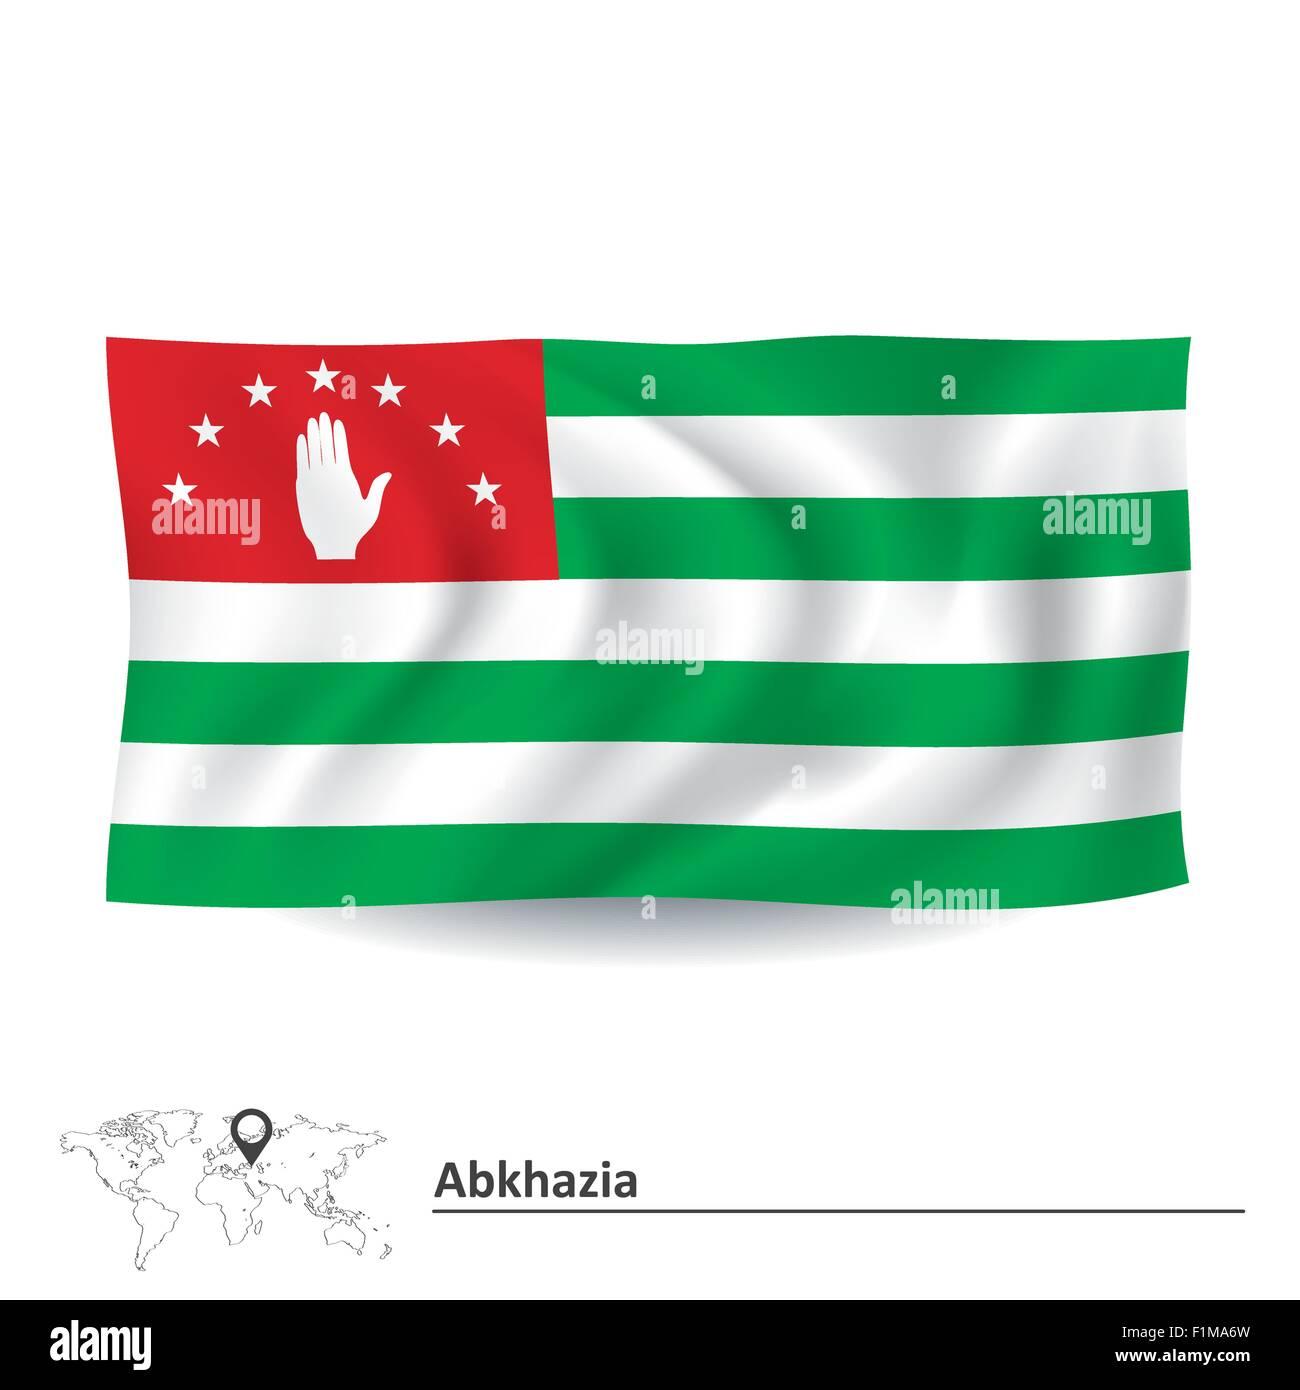 Flag of Abkhazia - vector illustration - Stock Image